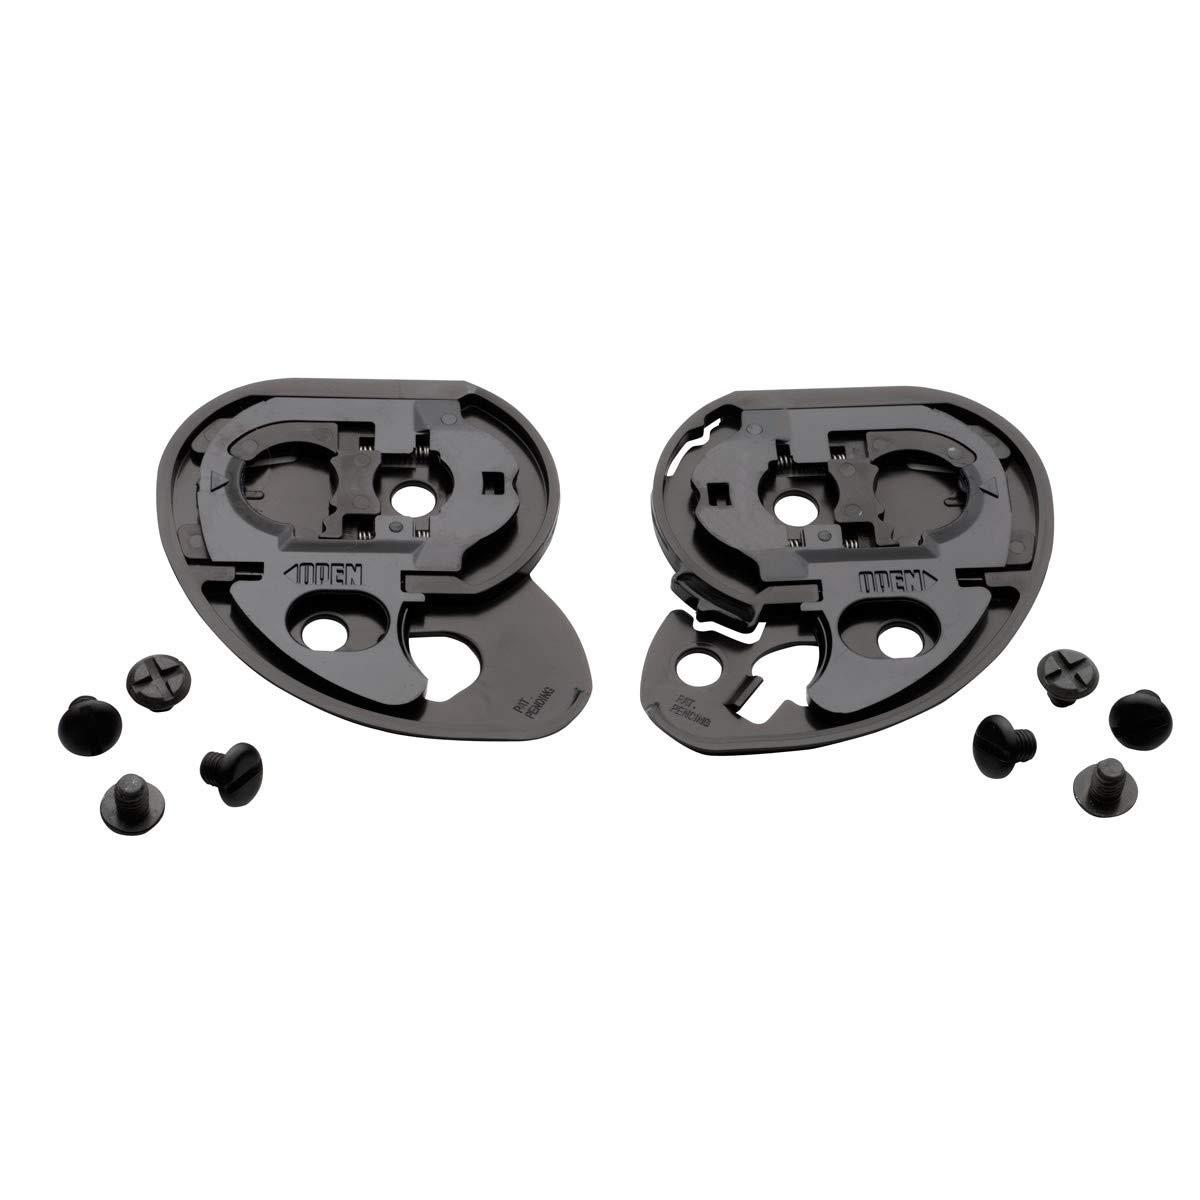 HJC Shield HJ-09 Side Gear Plate Set For cl-16, cl-15, cl-12, cl-sp, cs-r1, cs-r2, ac-10, ac-12, fs-15